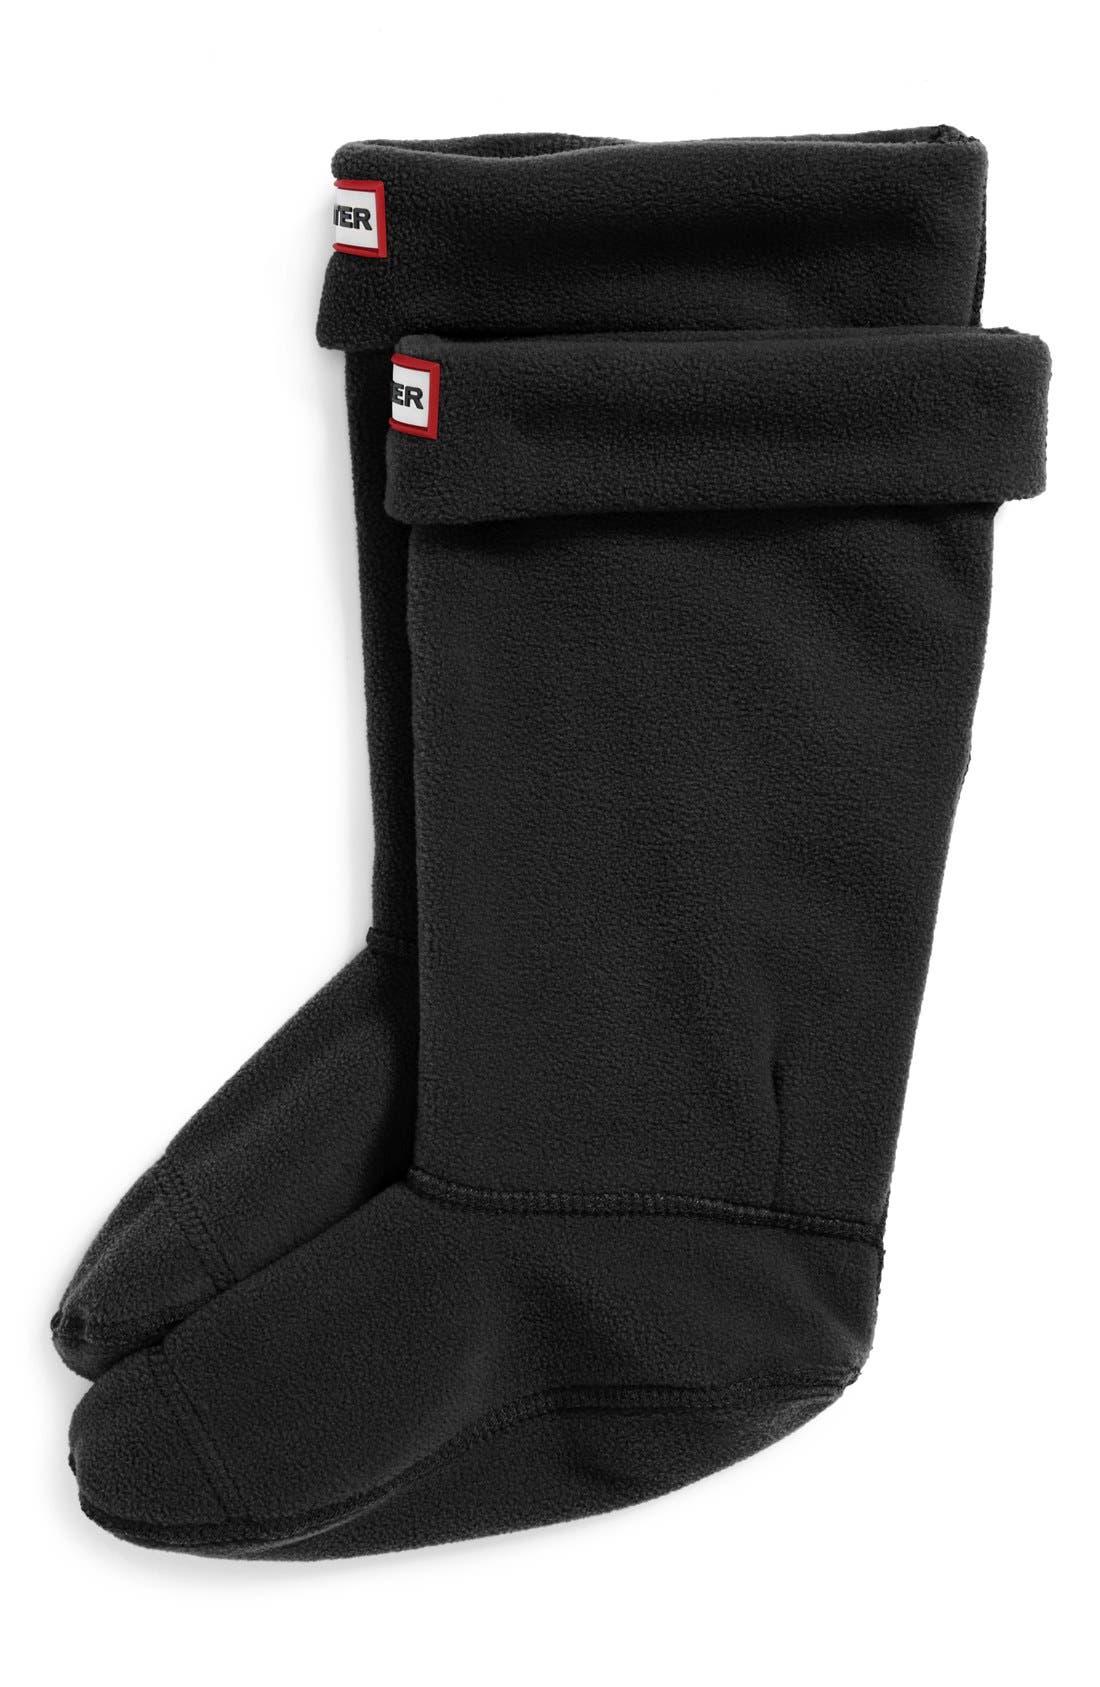 Alternate Image 1 Selected - Hunter Fleece Welly Boot Socks (Walker, Toddler, Little Kid & Big Kid)